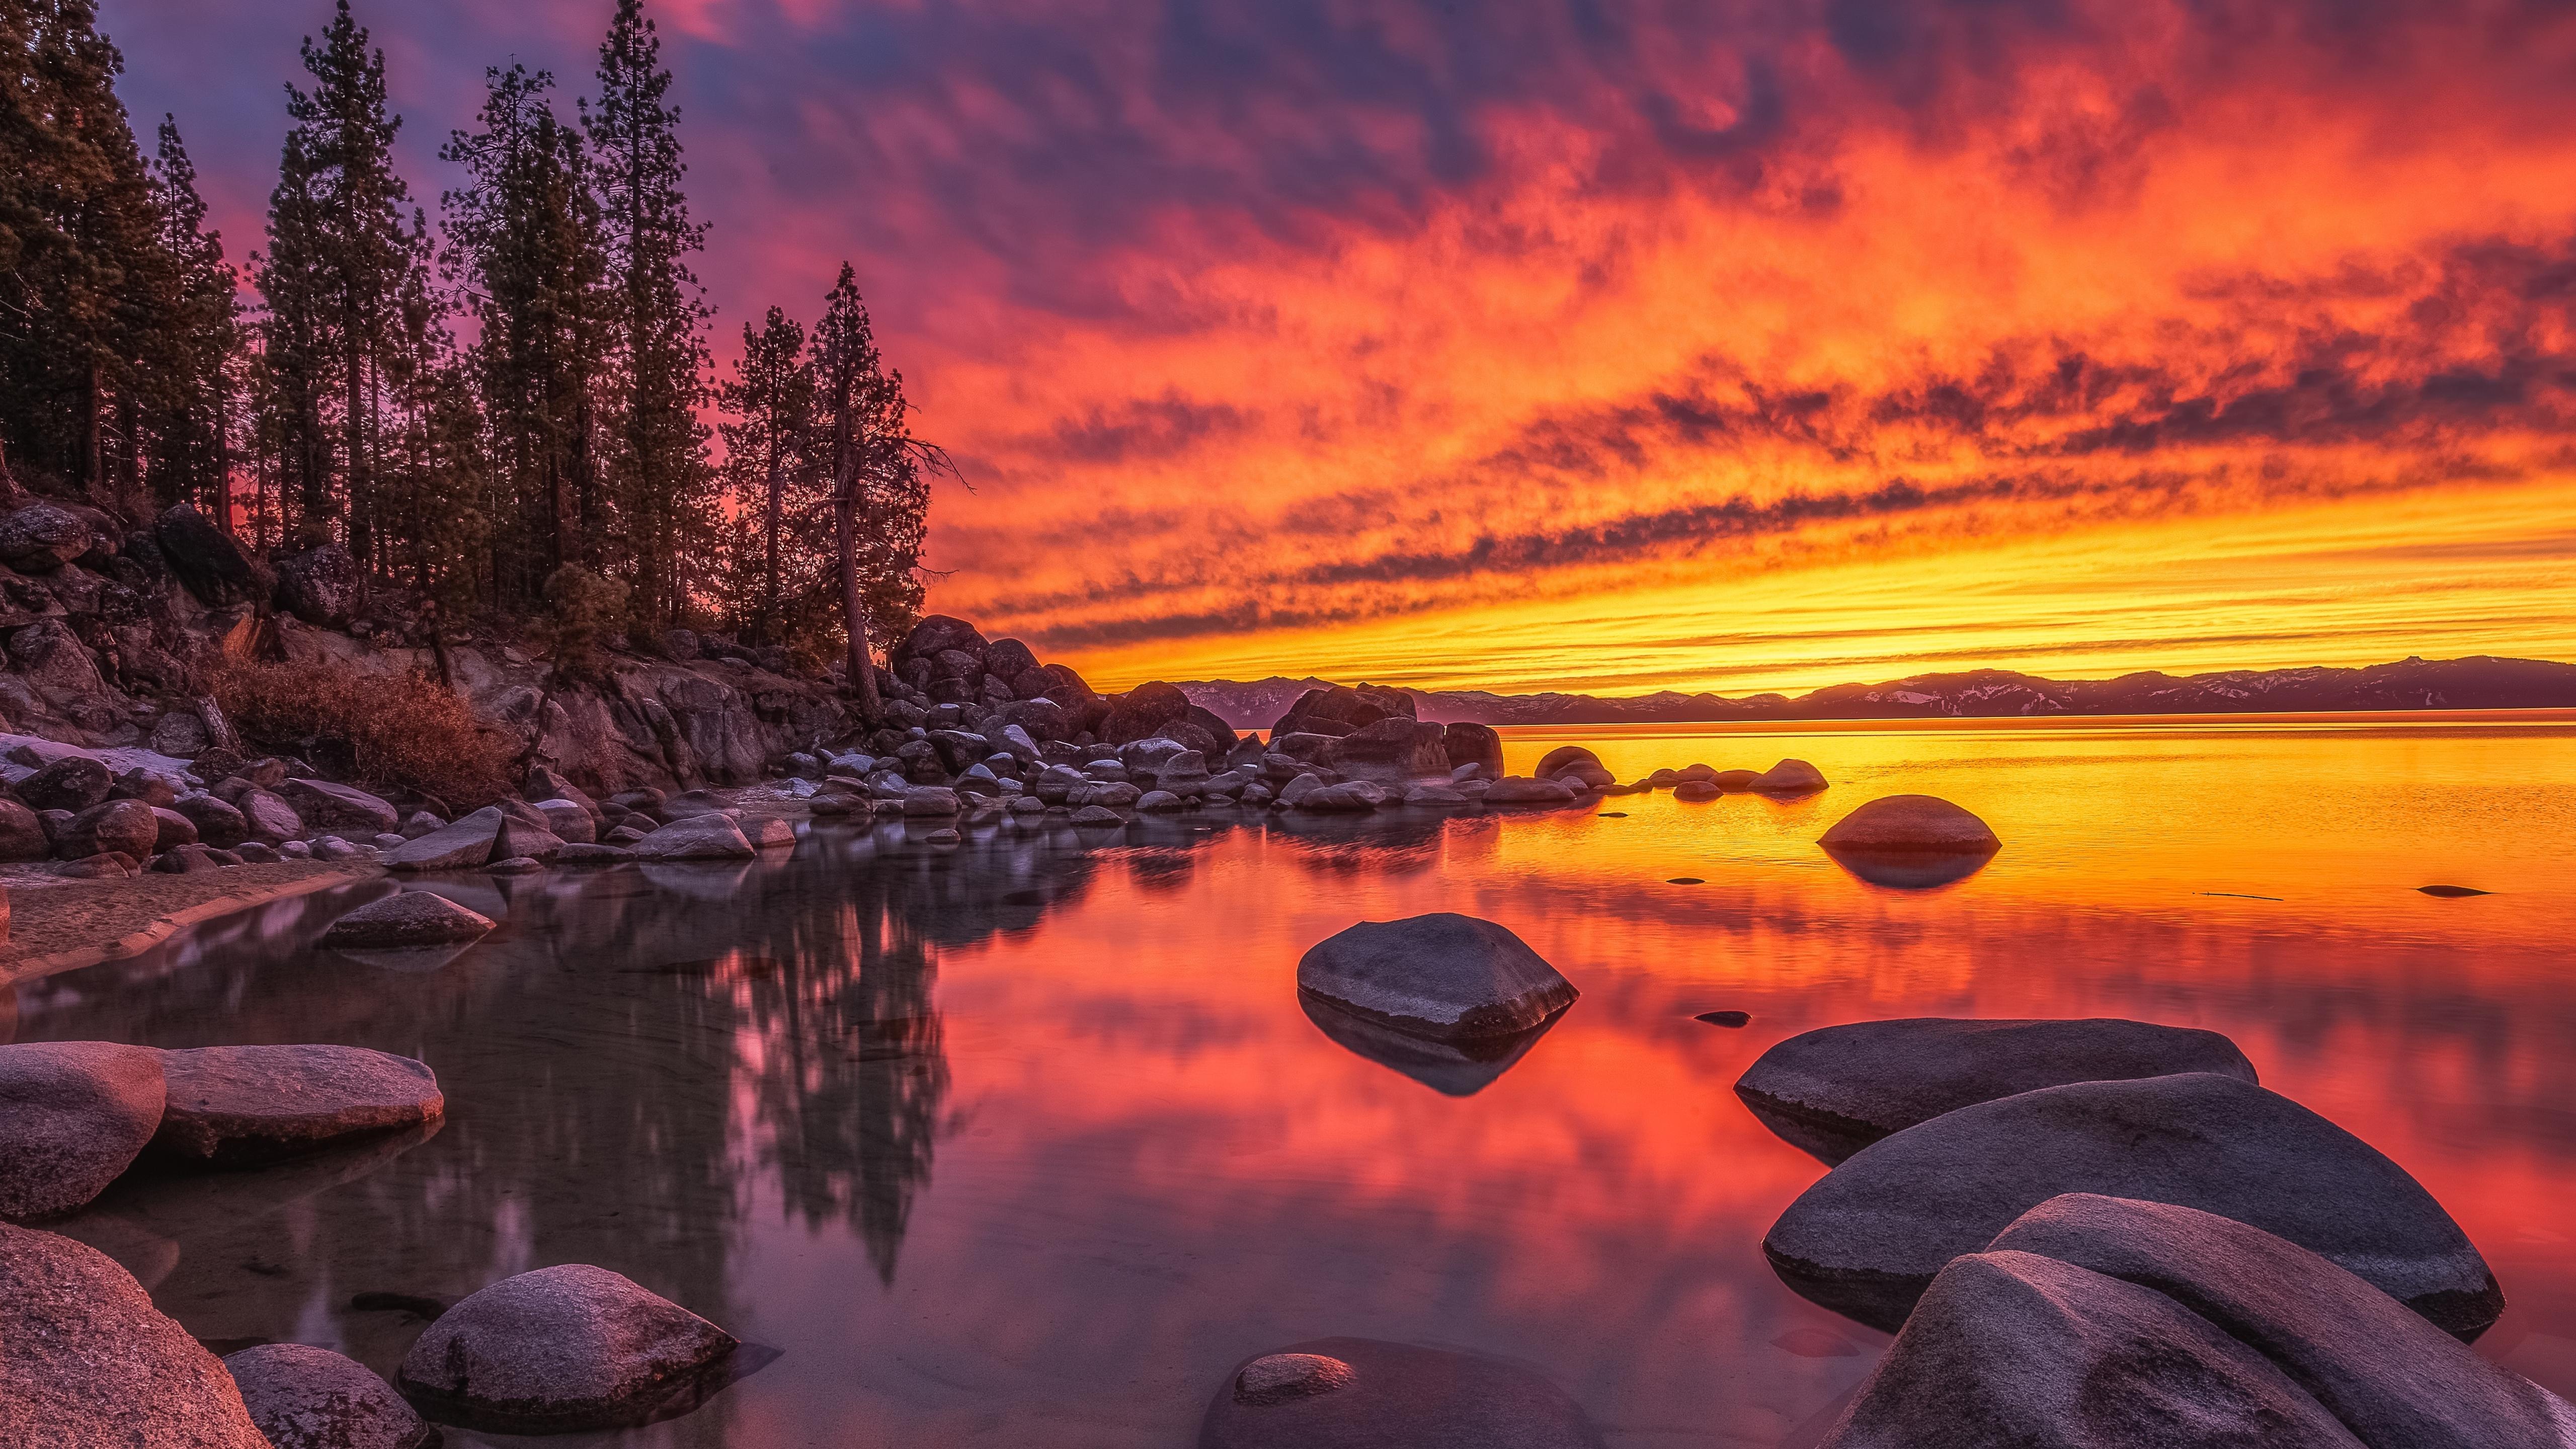 Lake Tahoe Nevada Wallpaper in 5120x2880 Resolution